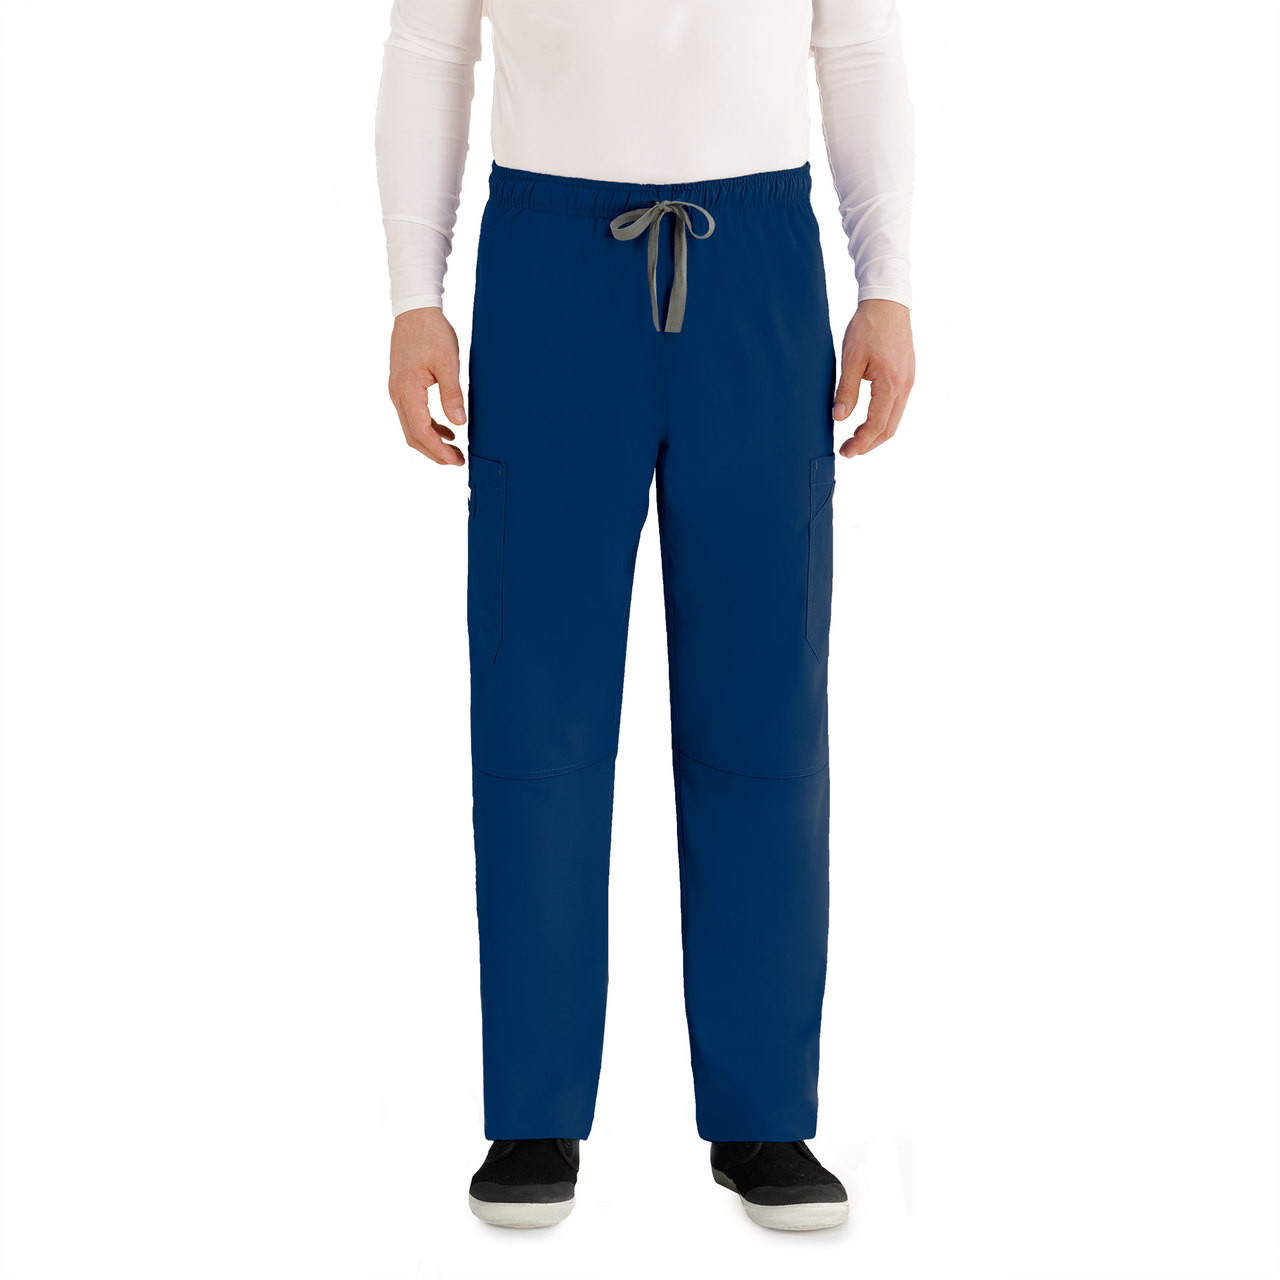 67ff62ecc88 0212) - Grey's Anatomy Scrubs - Modern Fit Cargo Scrub Pant | Jens ...